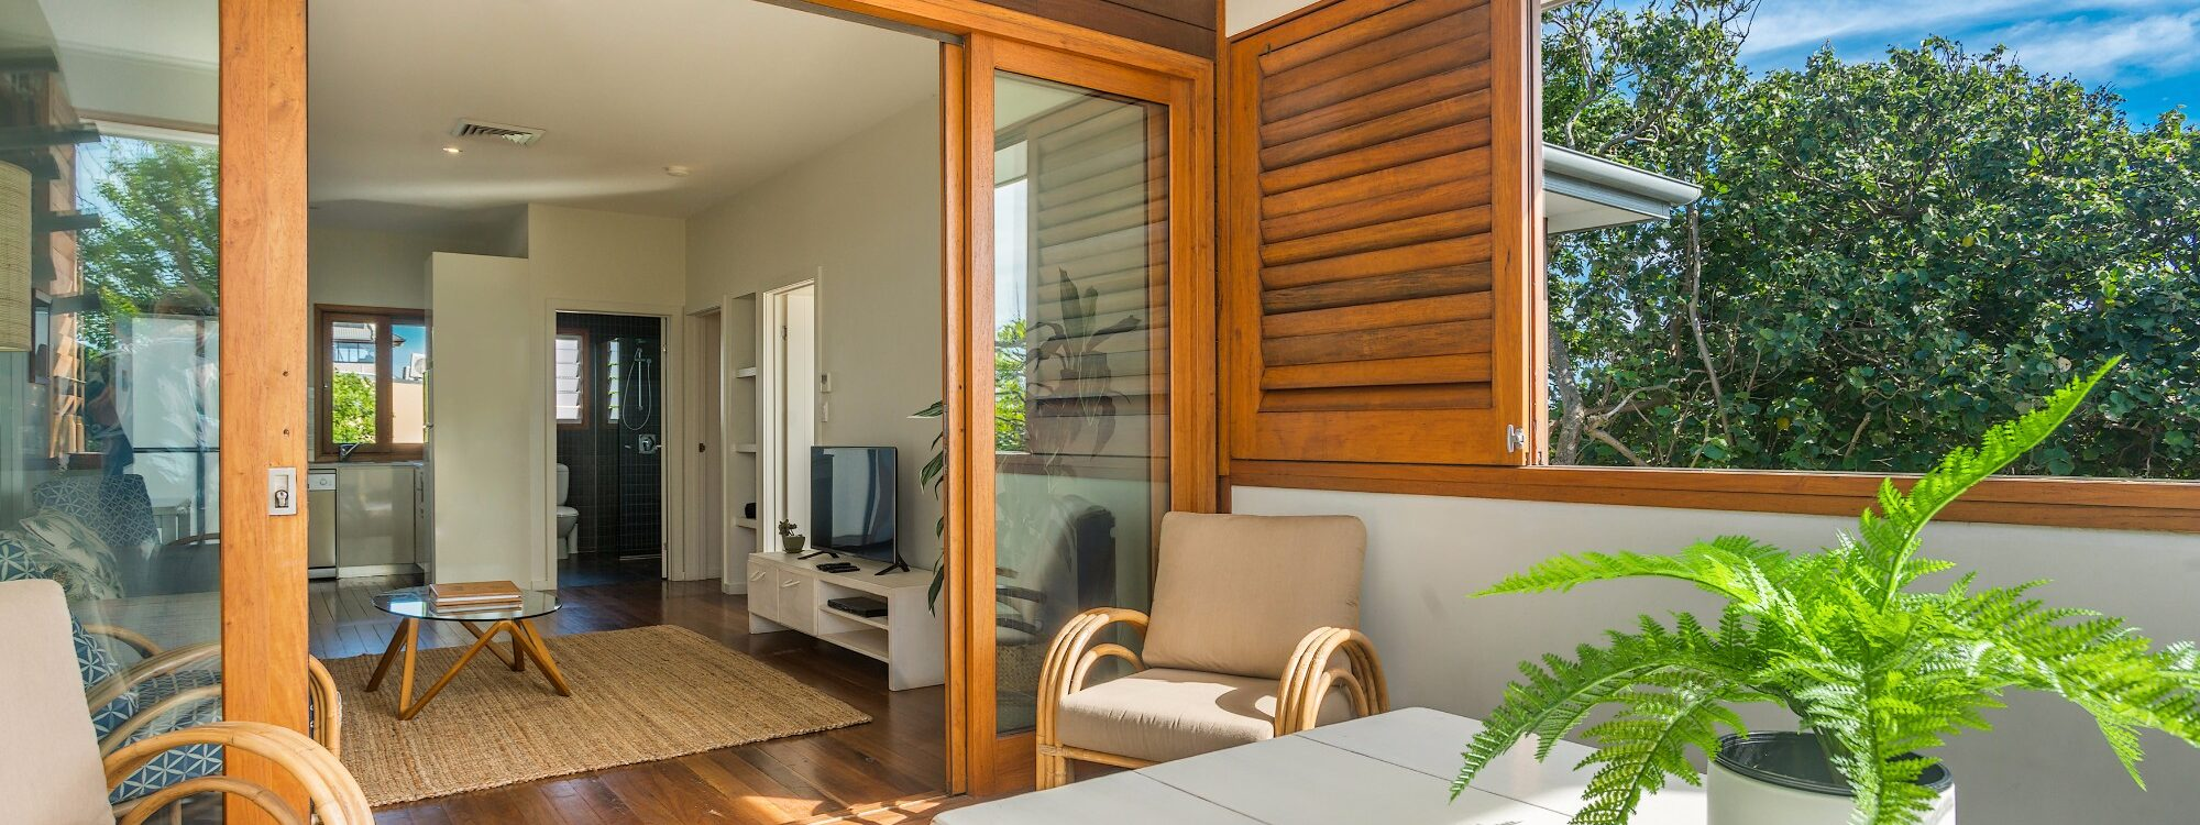 Quiksilver Apartments - The Wreck - spacious deck